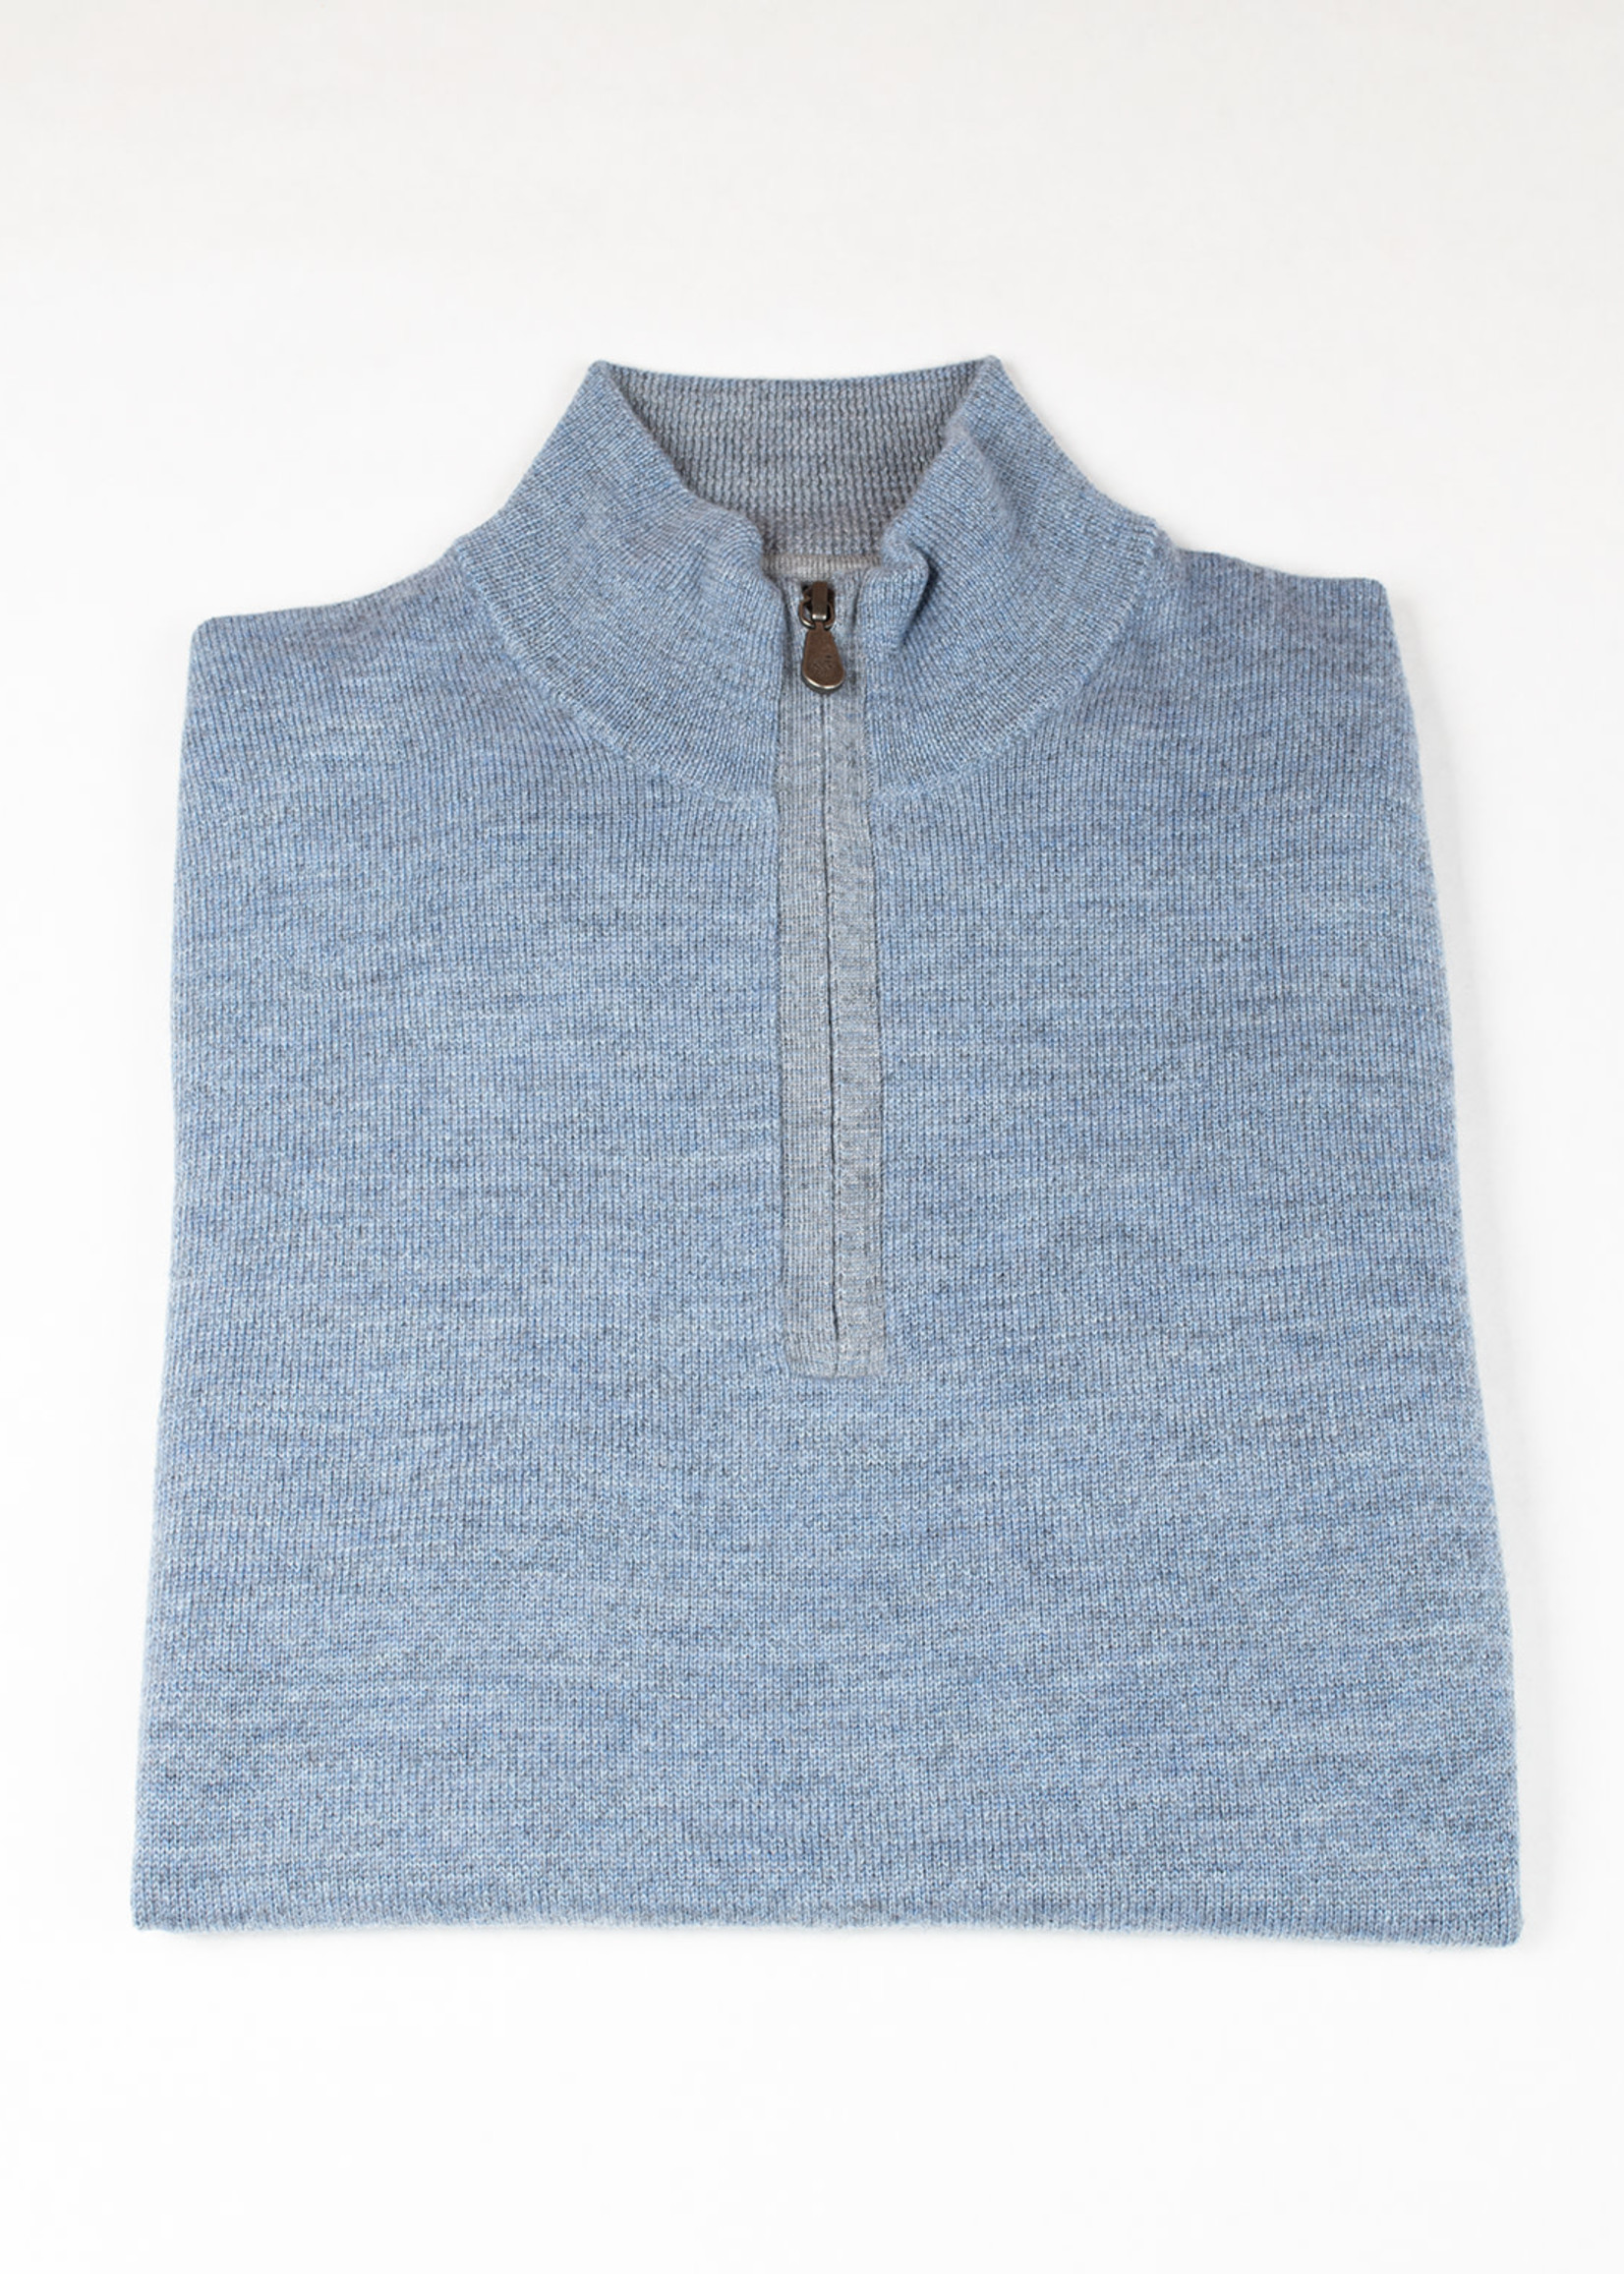 Raffi Raffi Storm Merino Wool 1/4 Zip